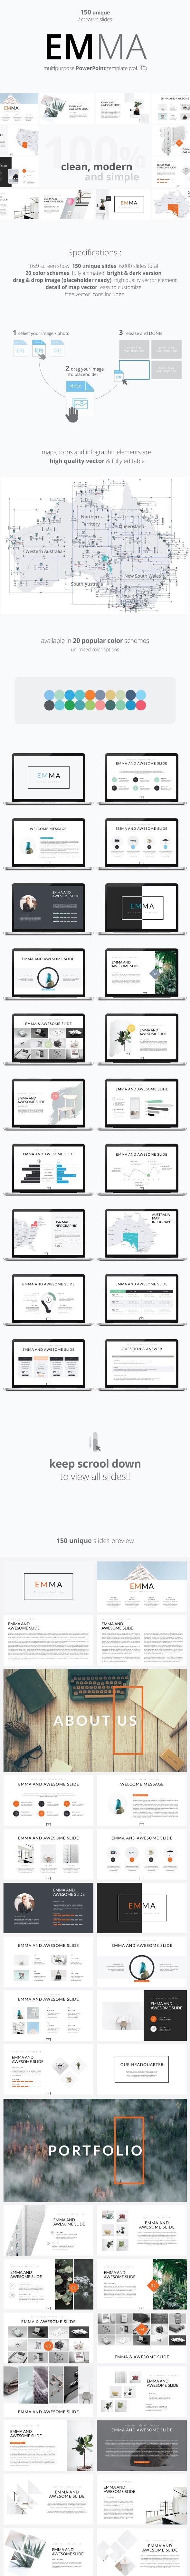 CREATOR Multipurpose Powerpoint Bundle Template - Business PowerPoint Templates